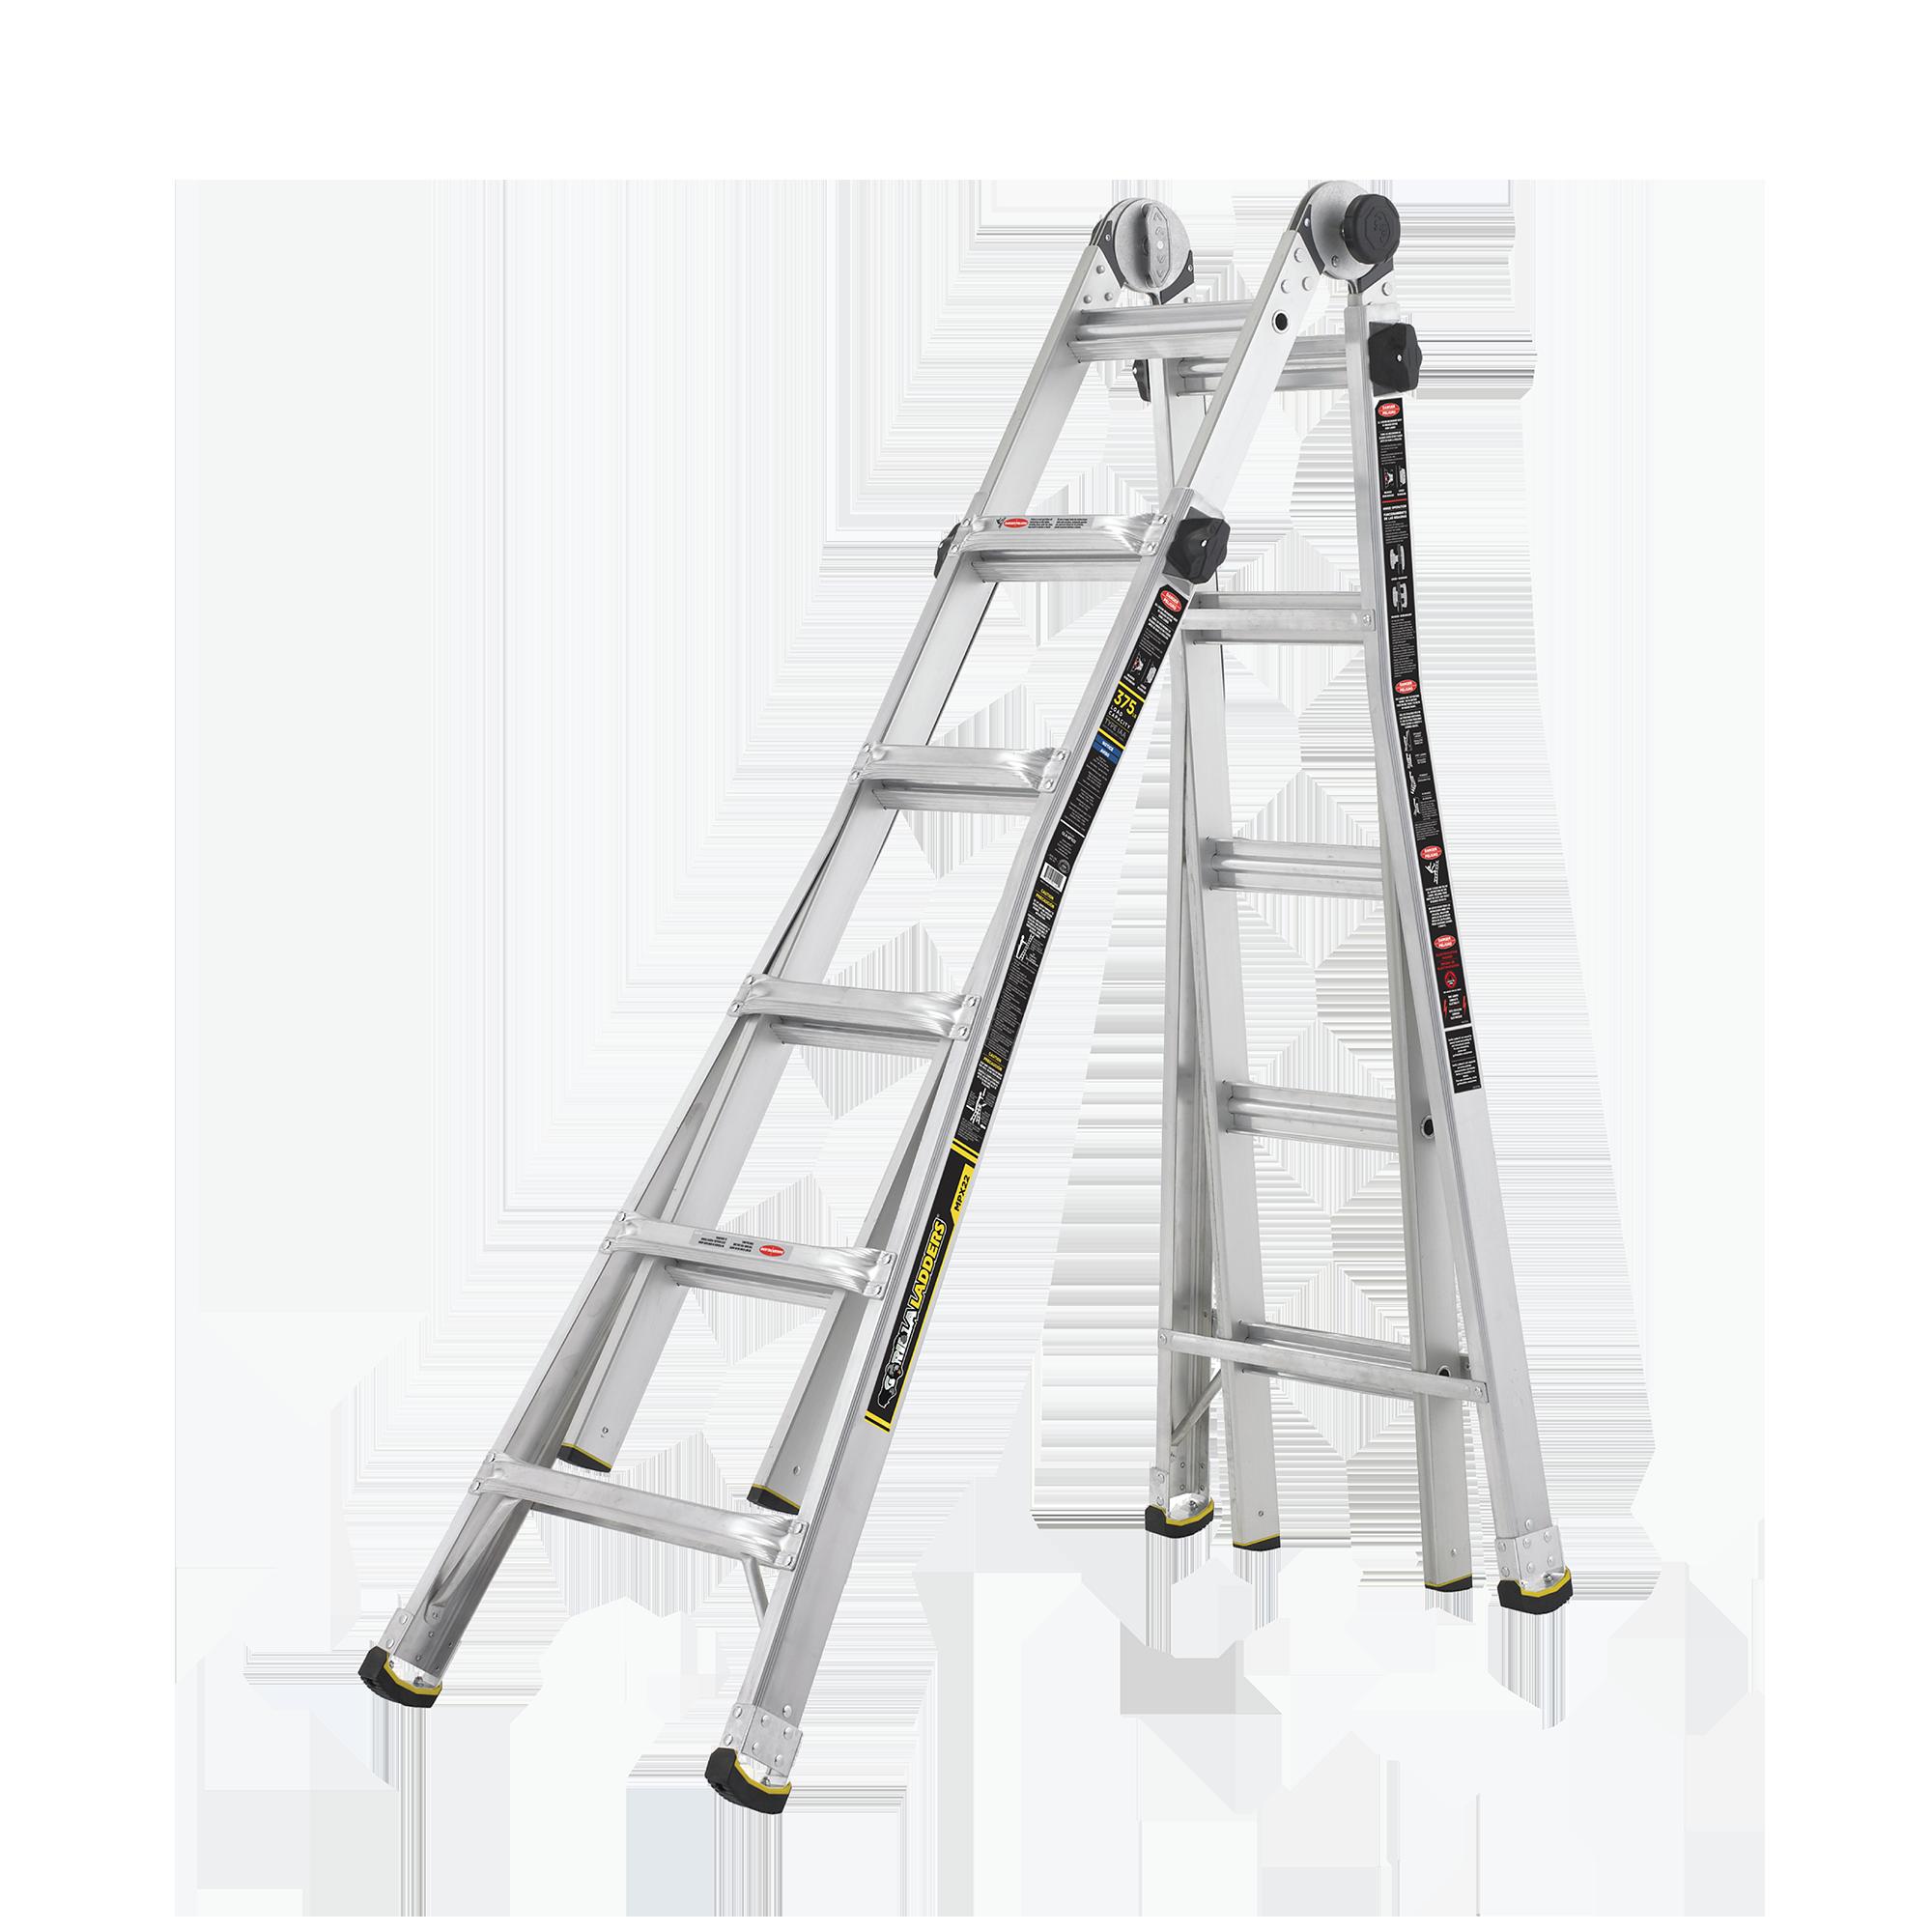 Home Depot Gorilla Ladder Stlfamilylife